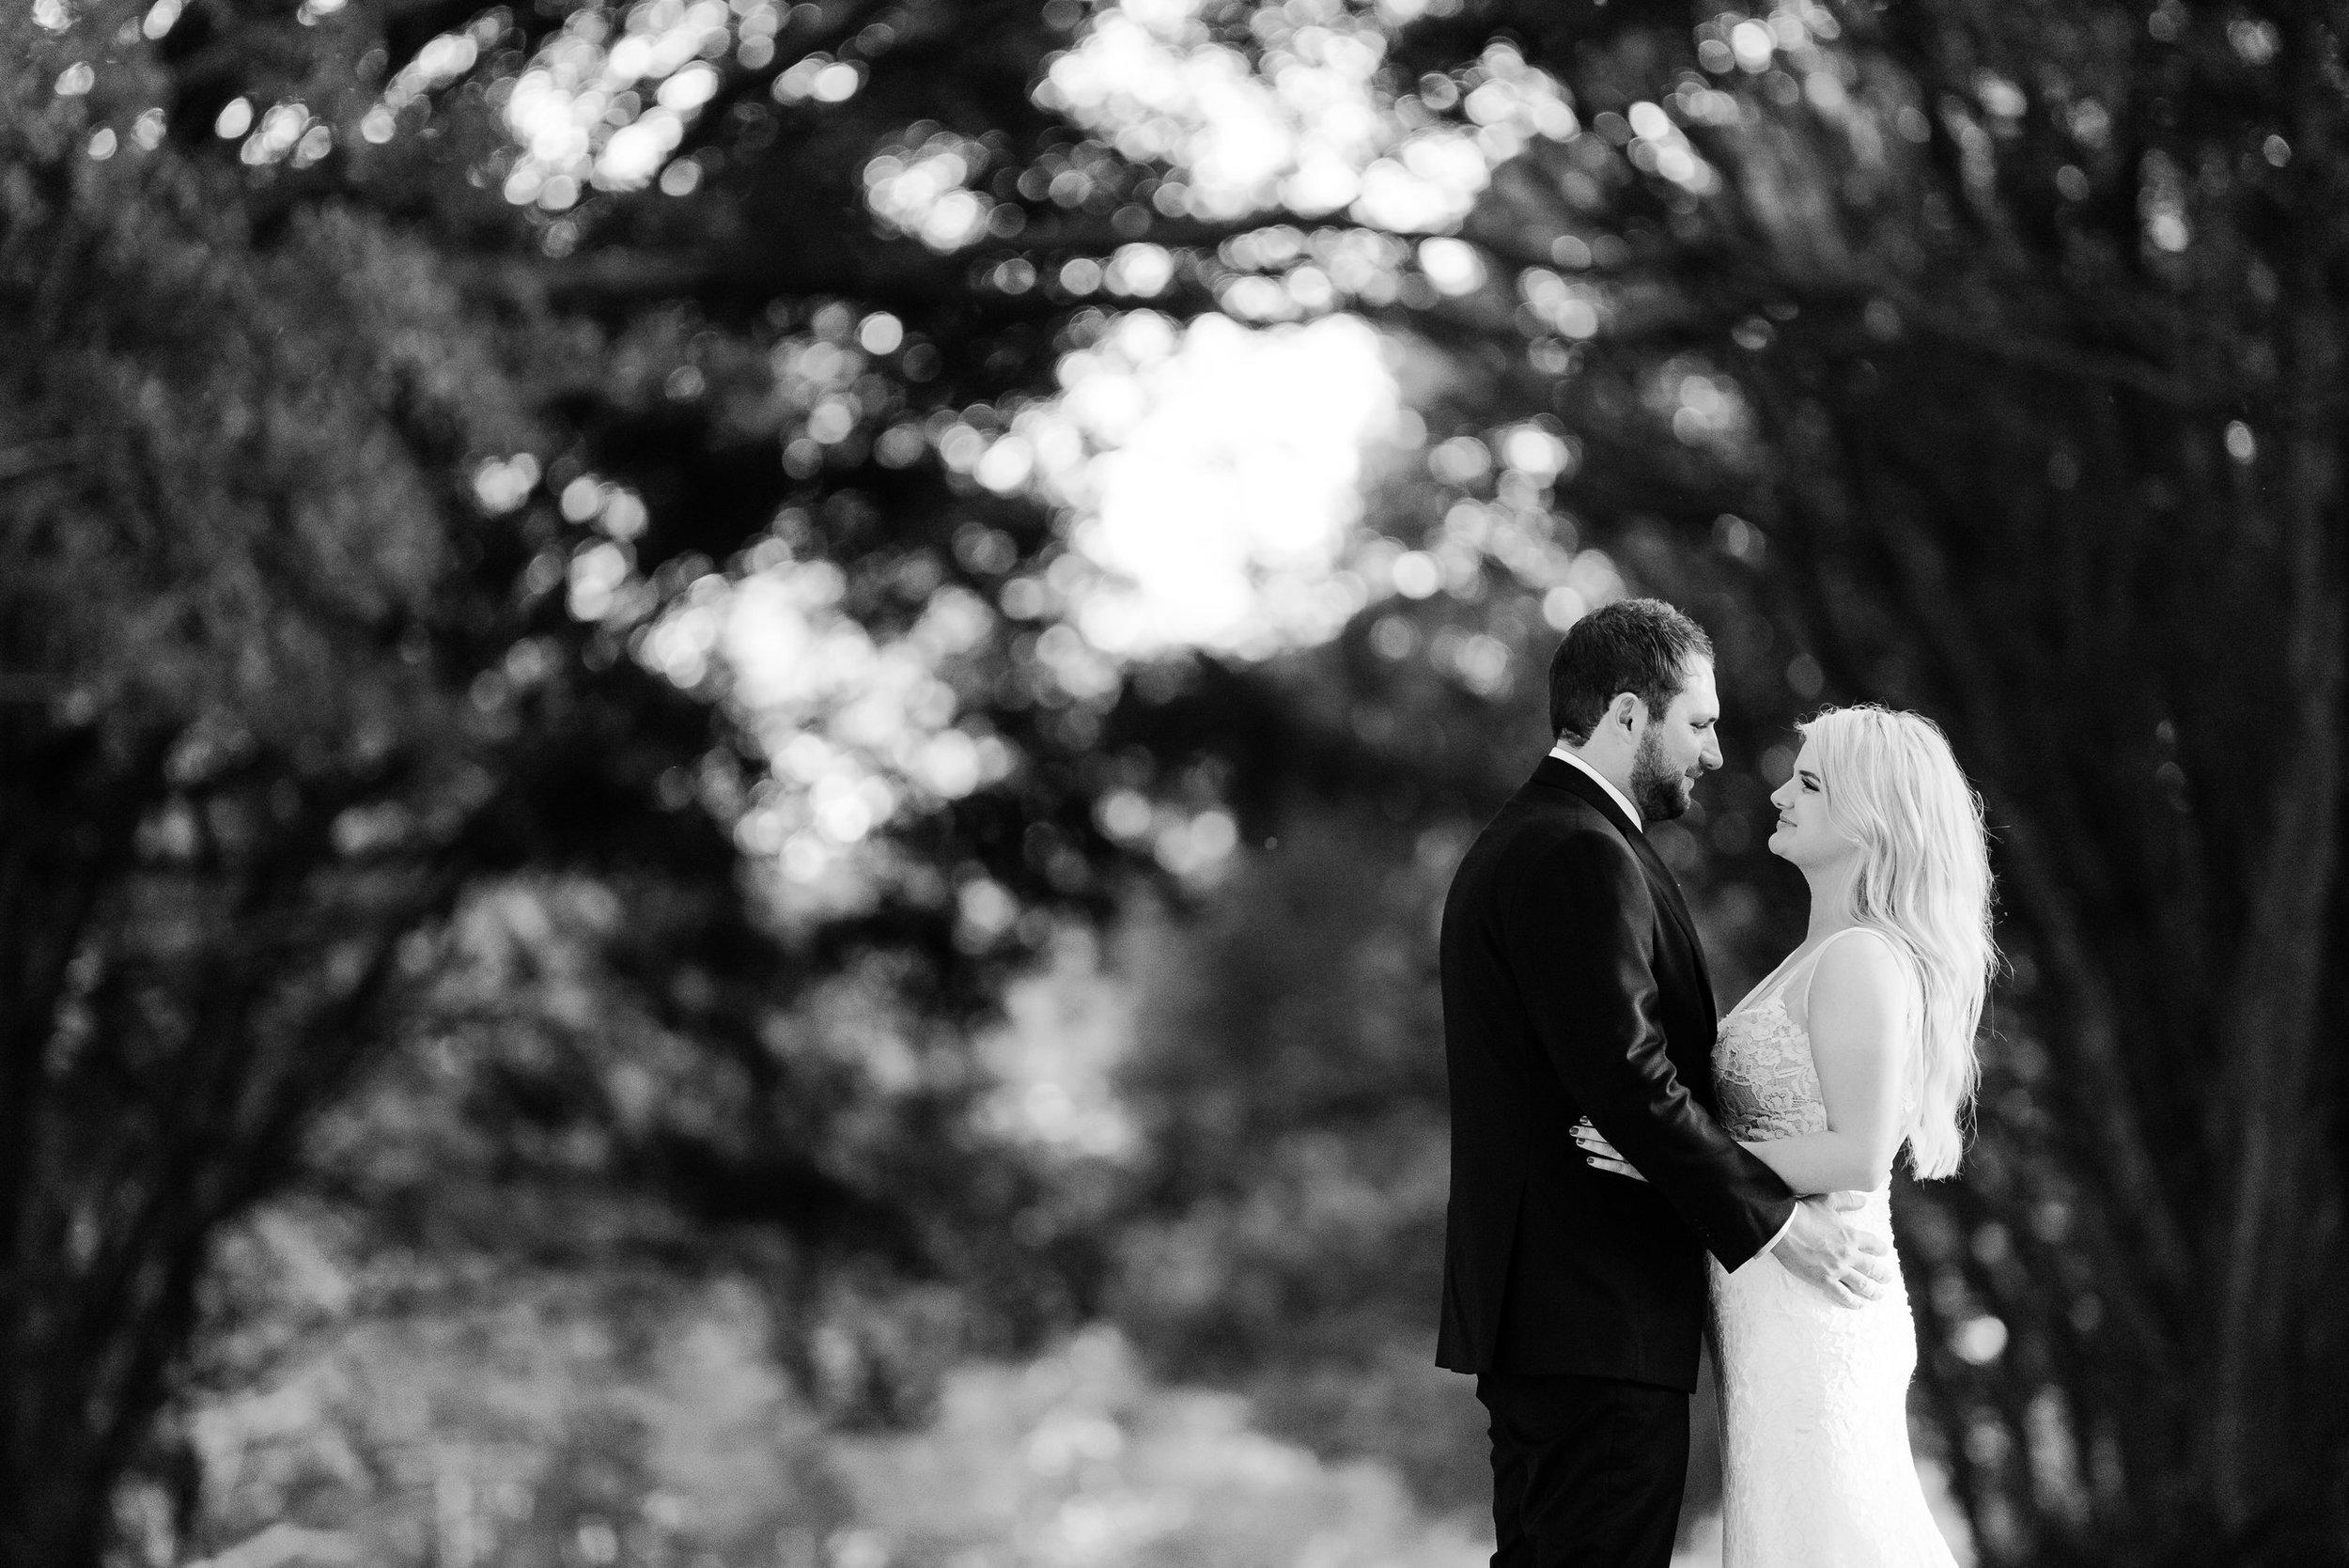 Justin_And_Jim_Photography_Byron_Bay_Wedding080.JPG